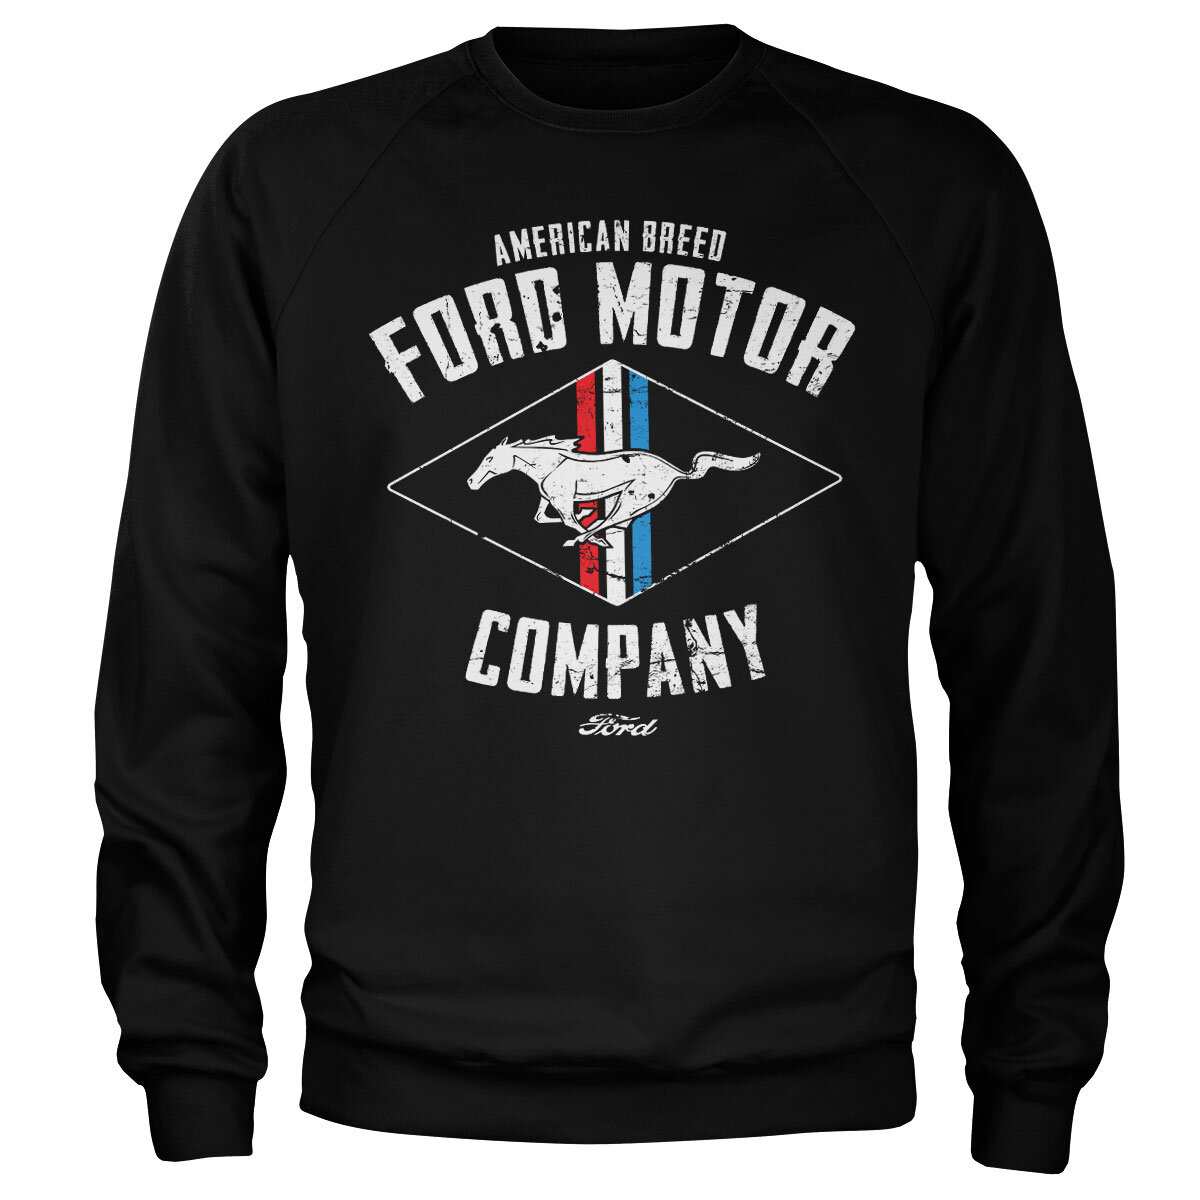 Ford Motor - American Breed Sweatshirt